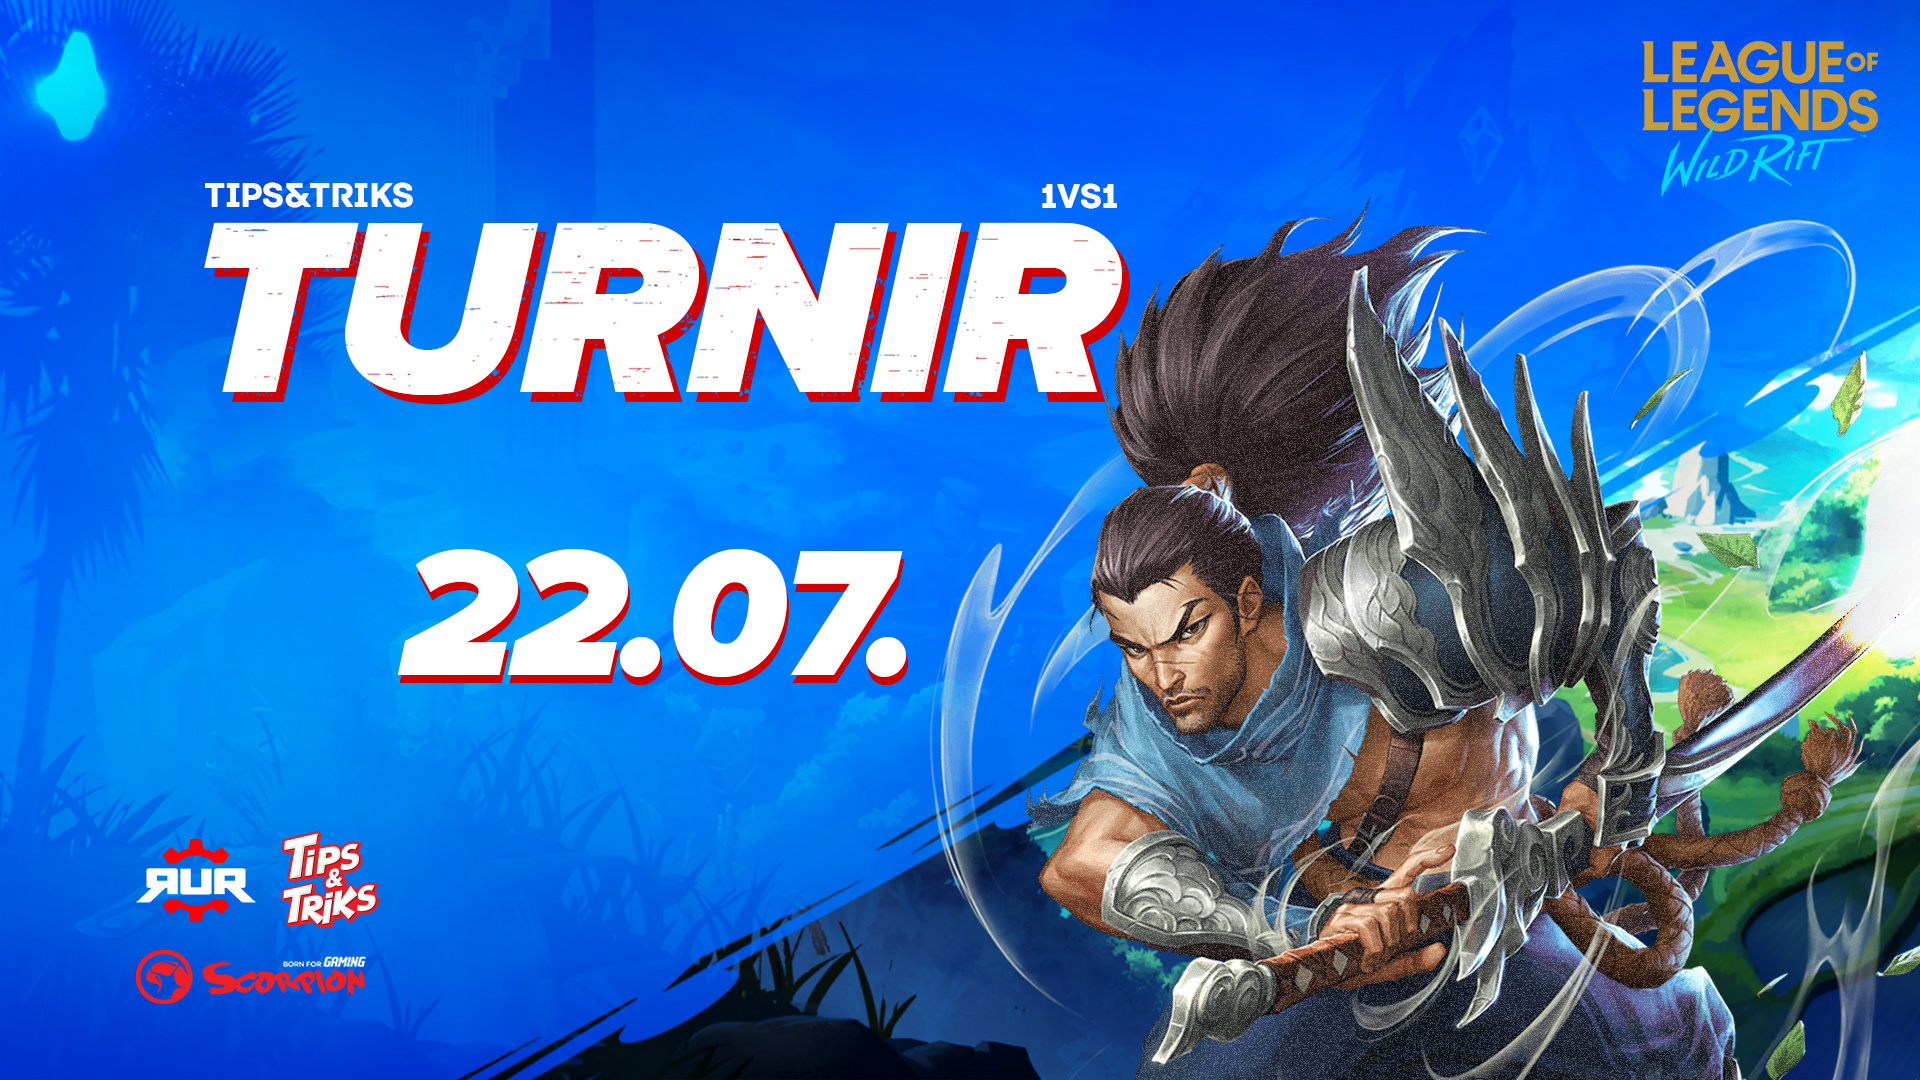 tnt-wild-rift-jul2021